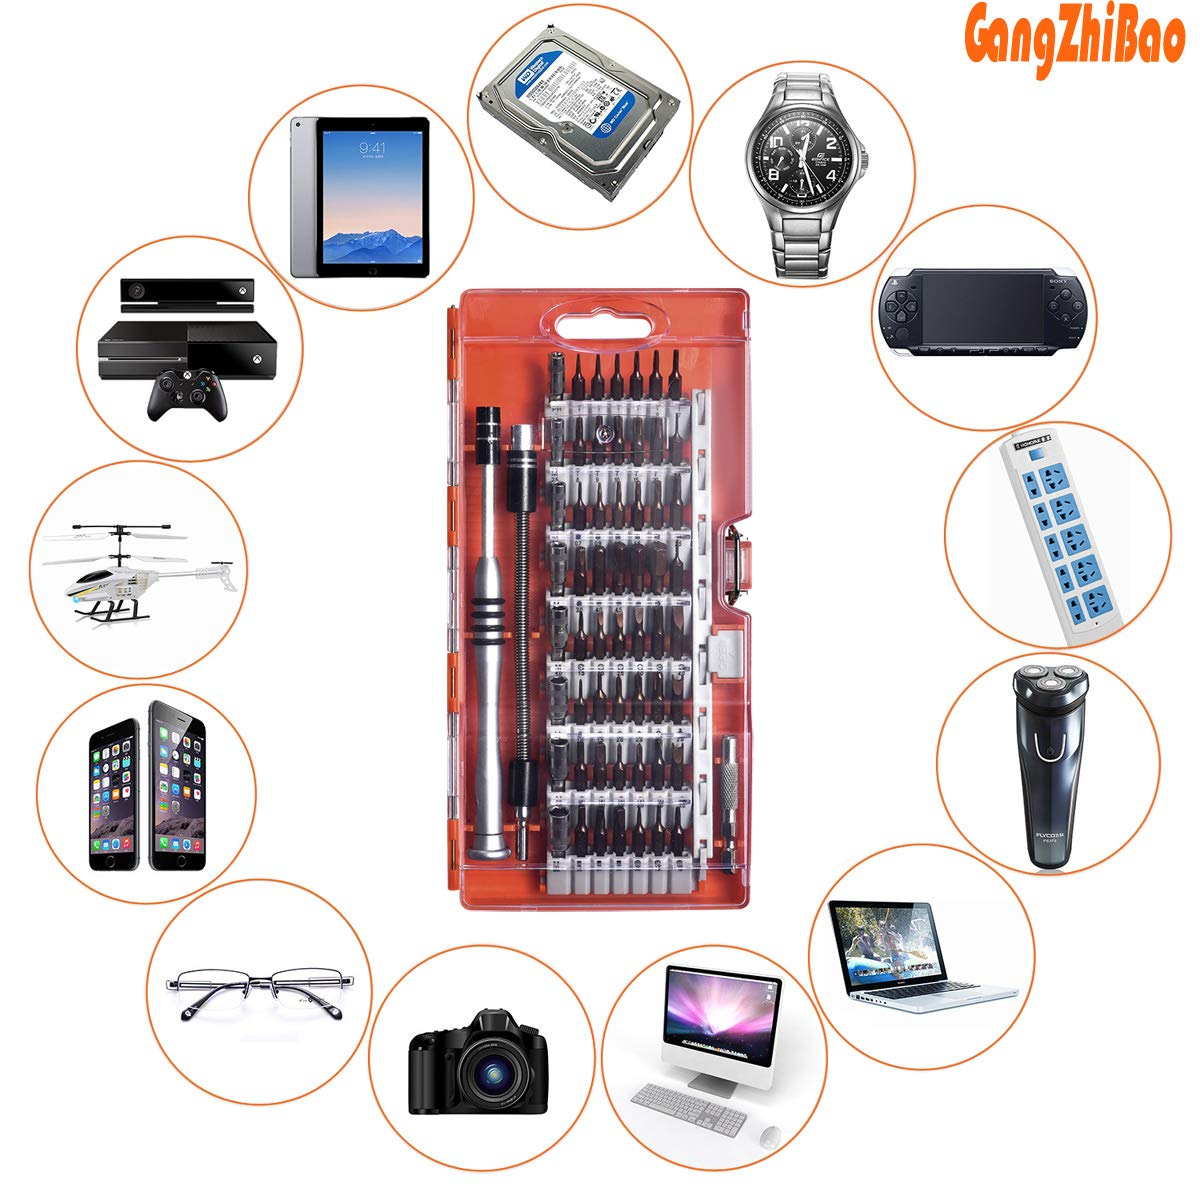 90 pcs Repair Tool Kits,Screwdriver Set for Phones Computers Pads Electronics